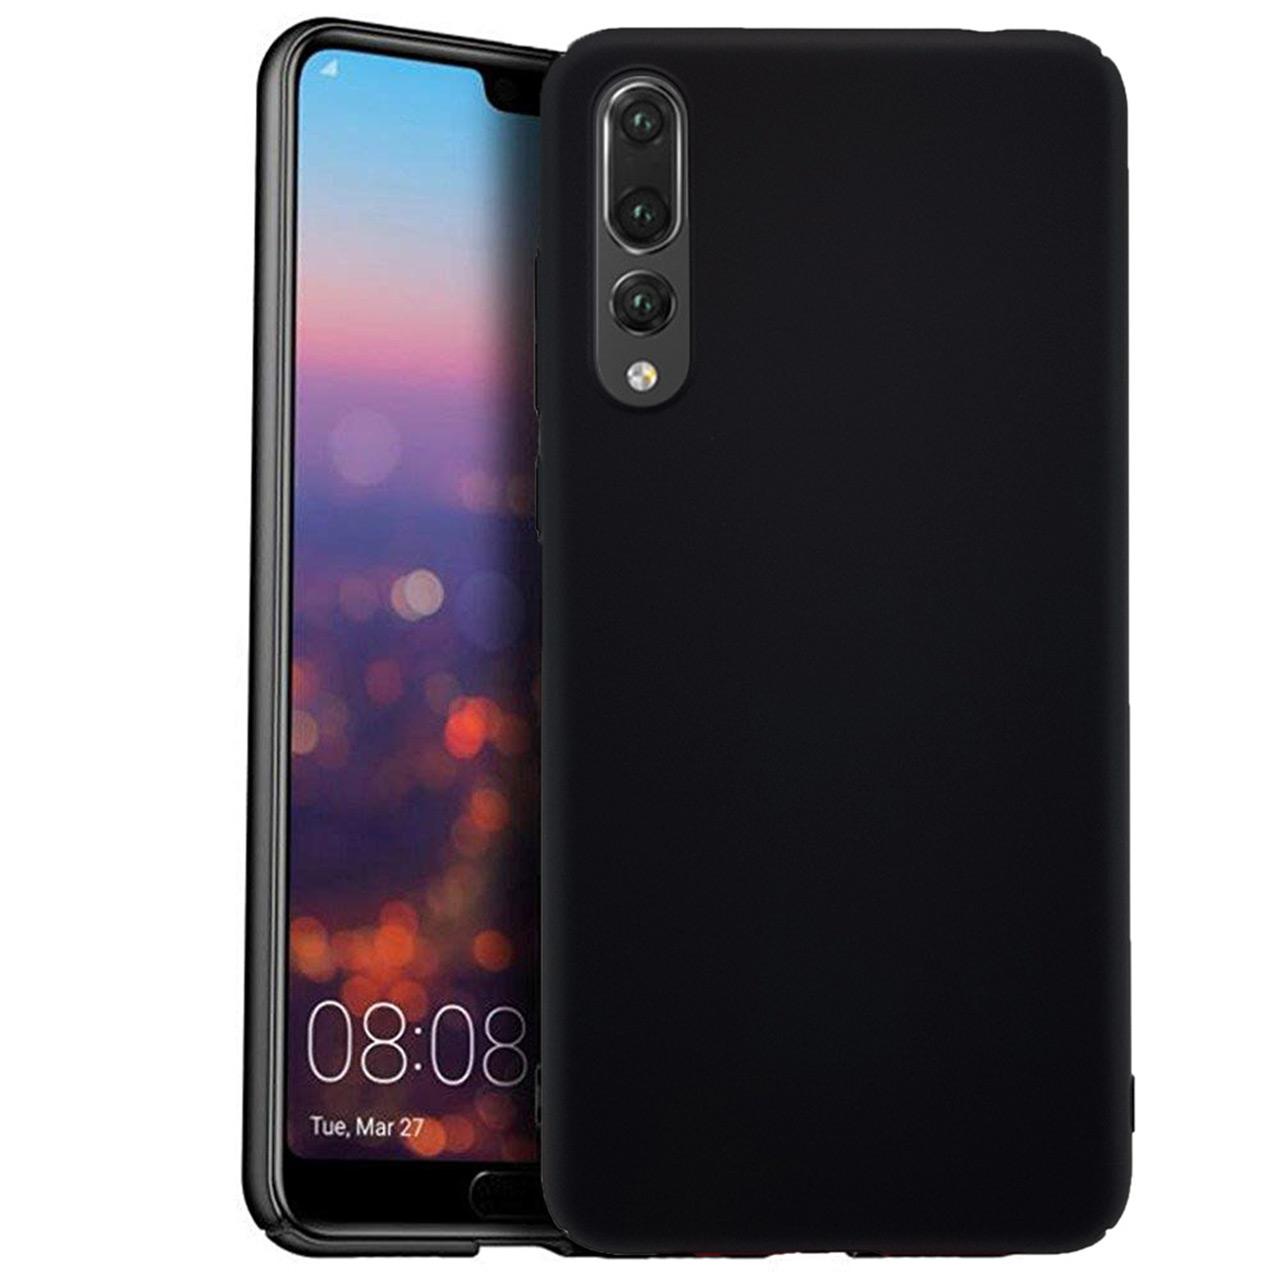 کاور آیپکی مدل Hard Case مناسب برای گوشی موبایل Huawei P20 Pro